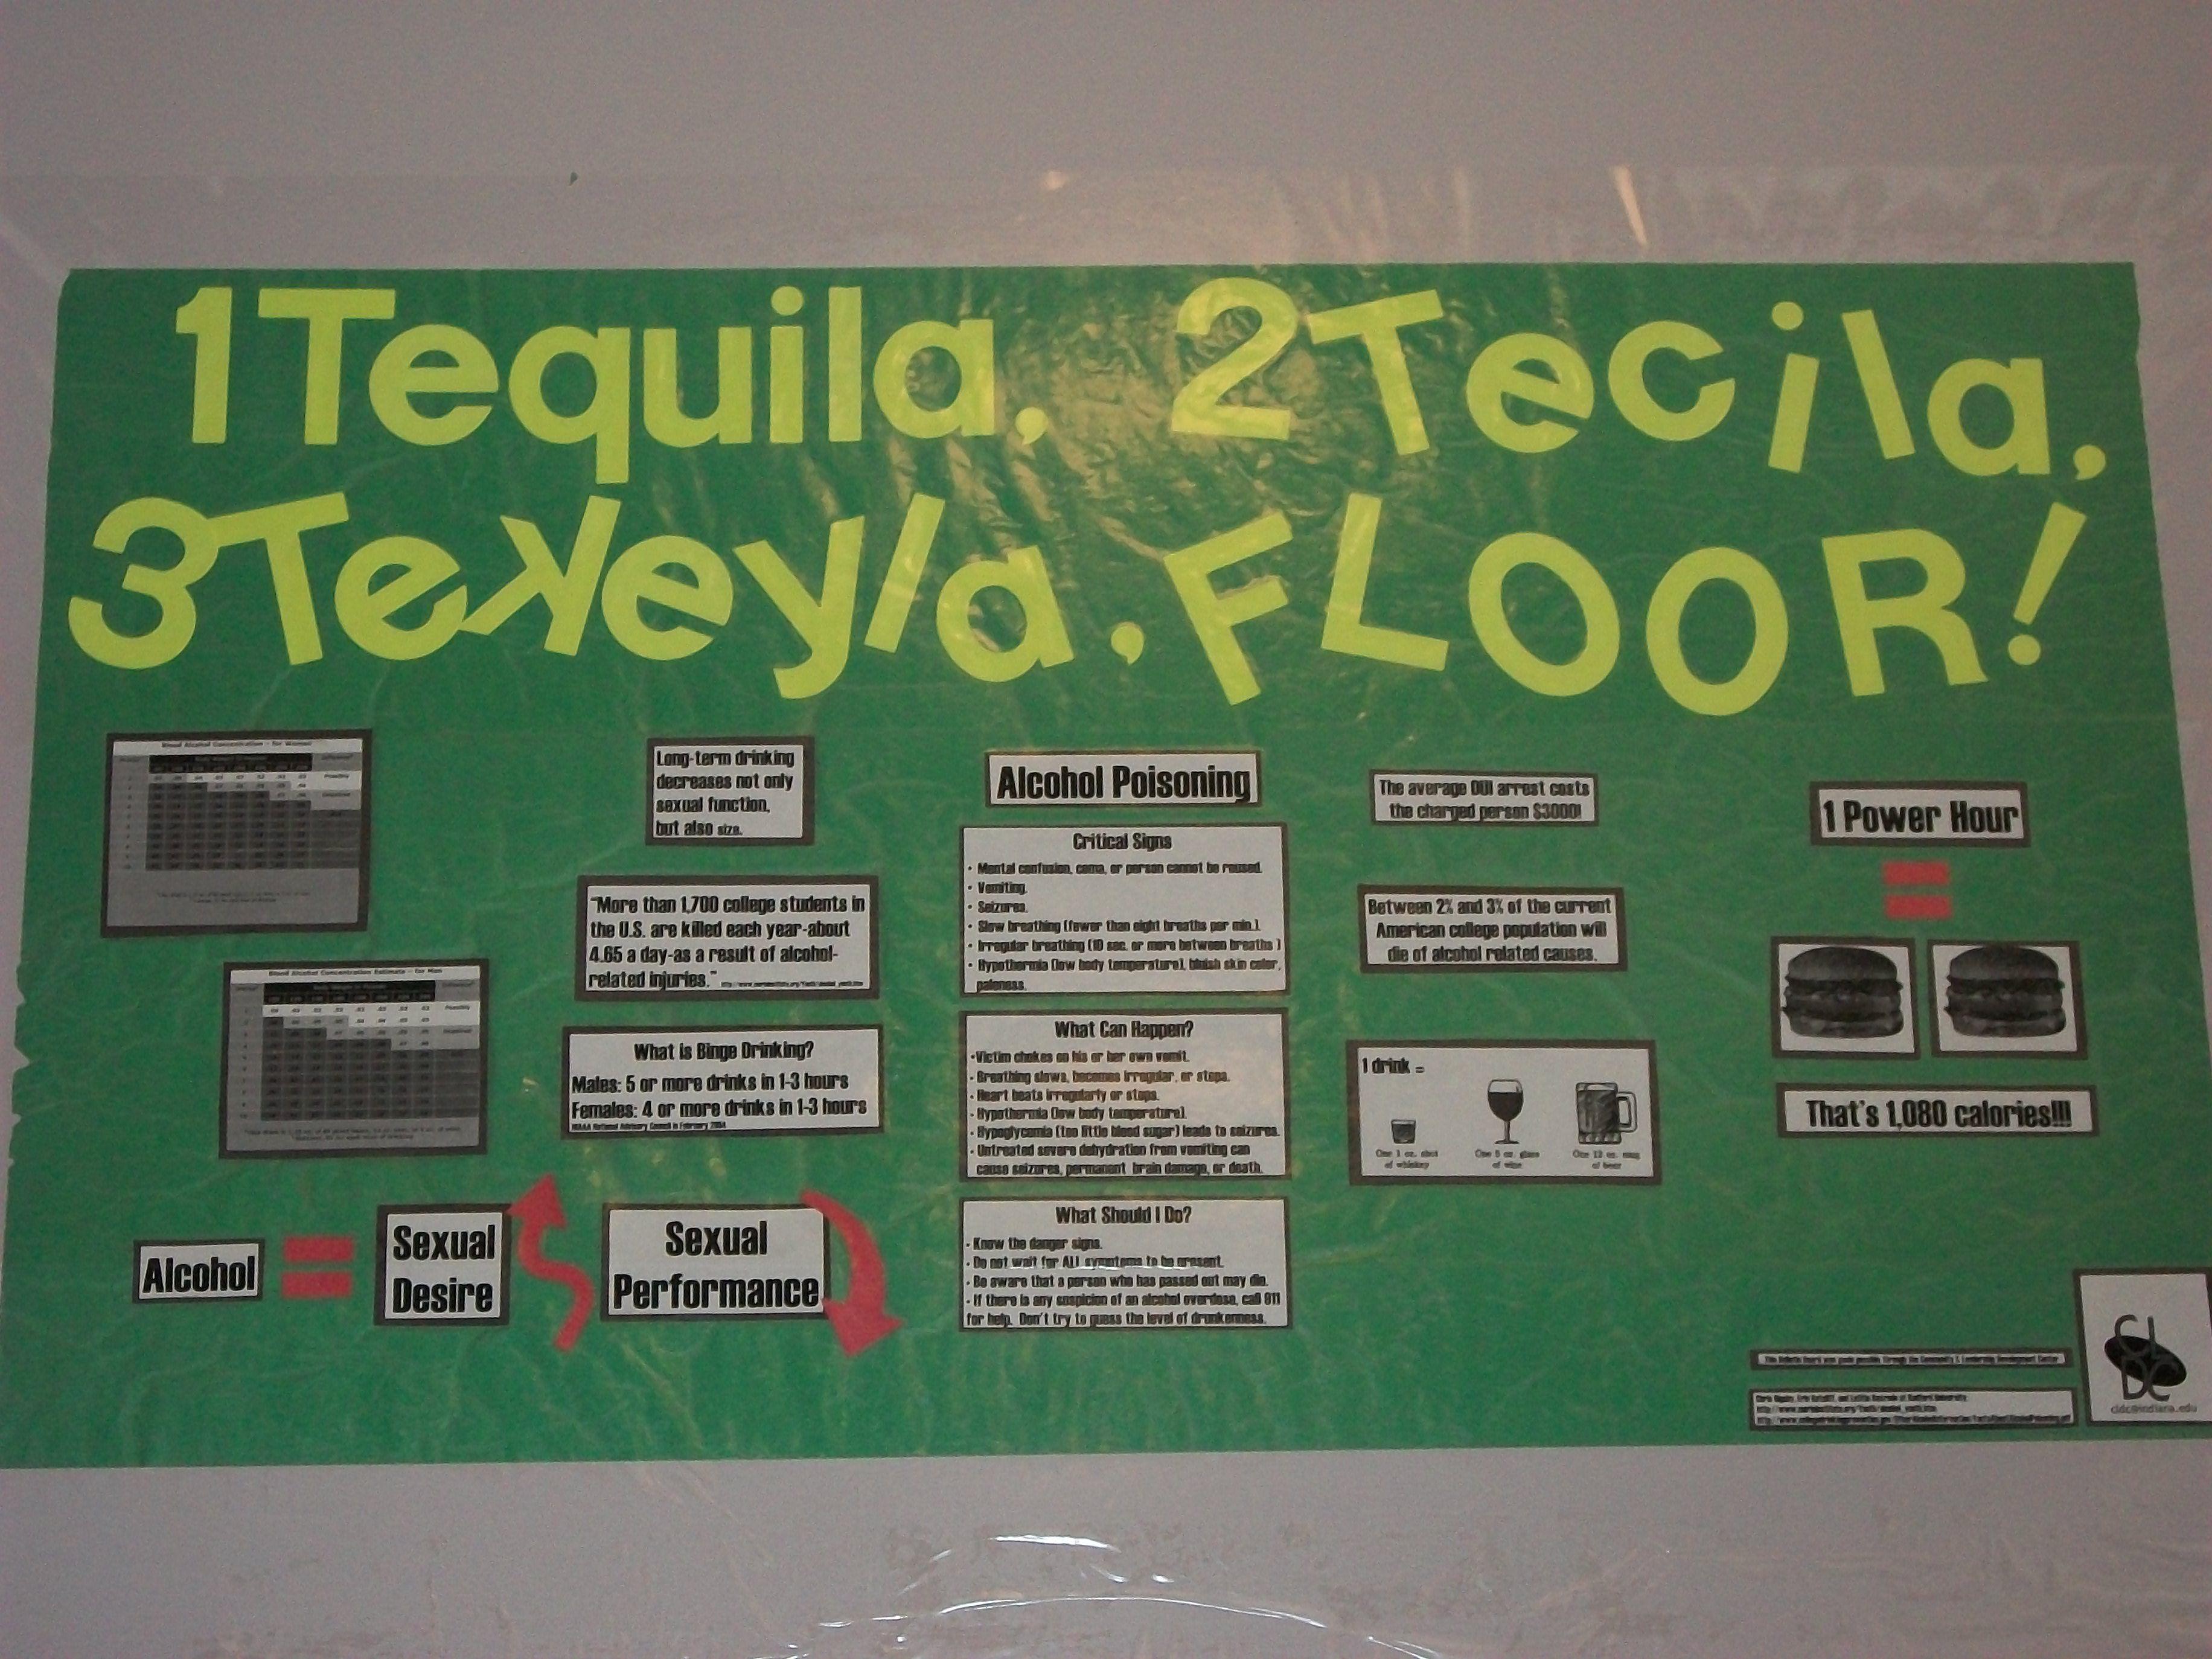 RA bulletin board on alcohol...great sense of humor yet